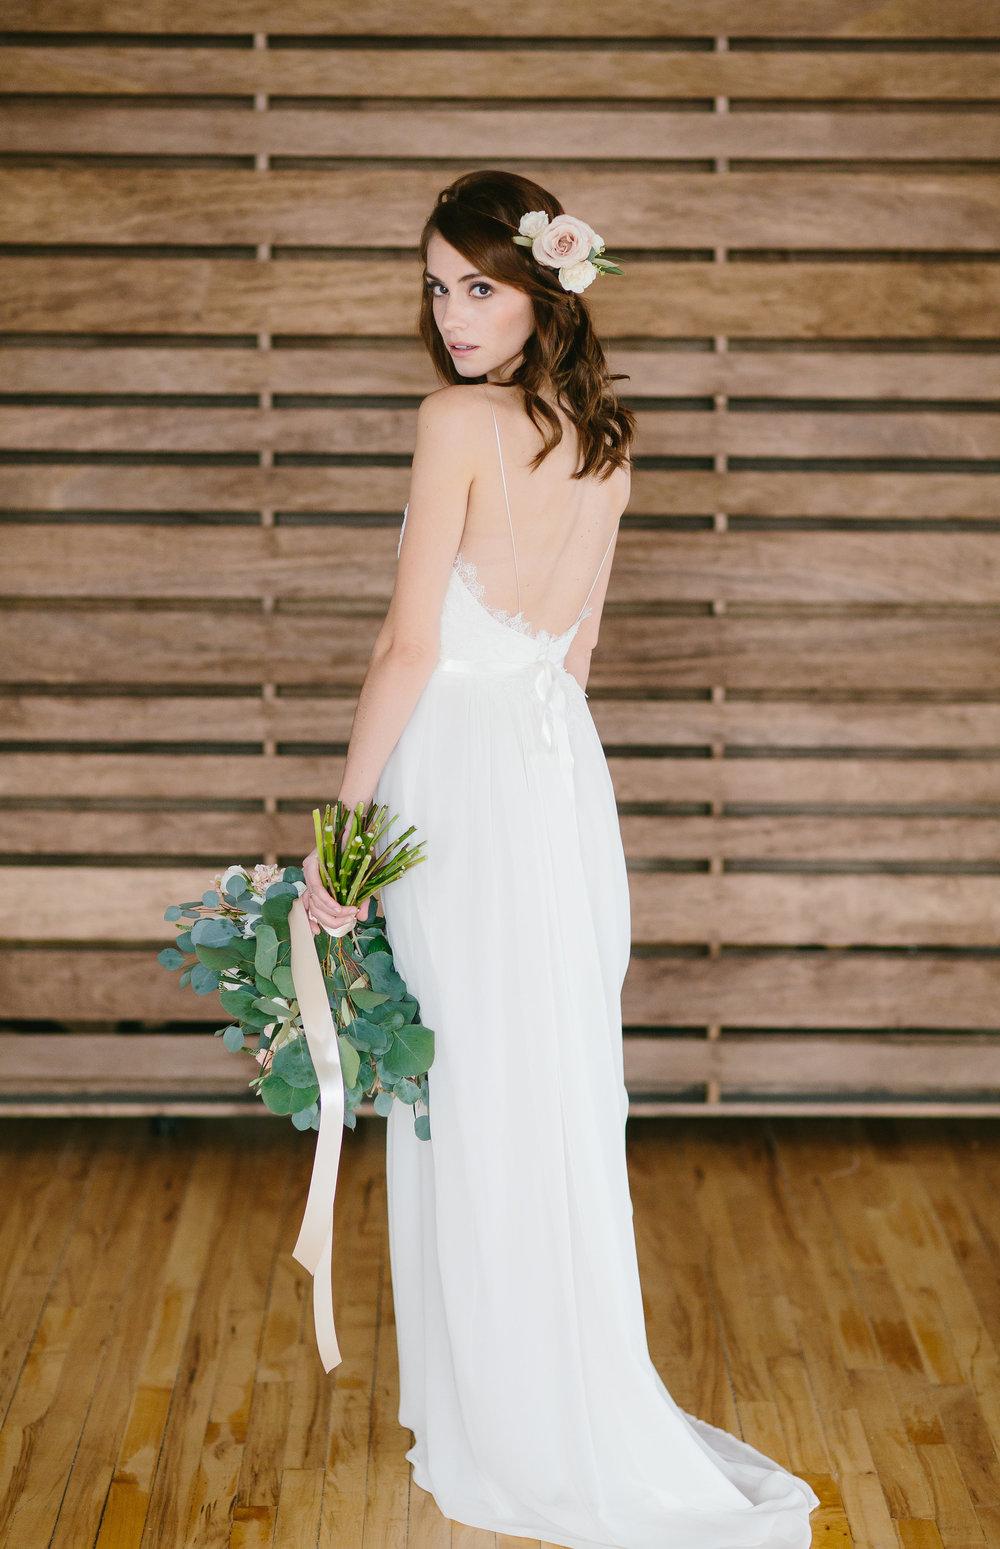 bridal-76.jpg